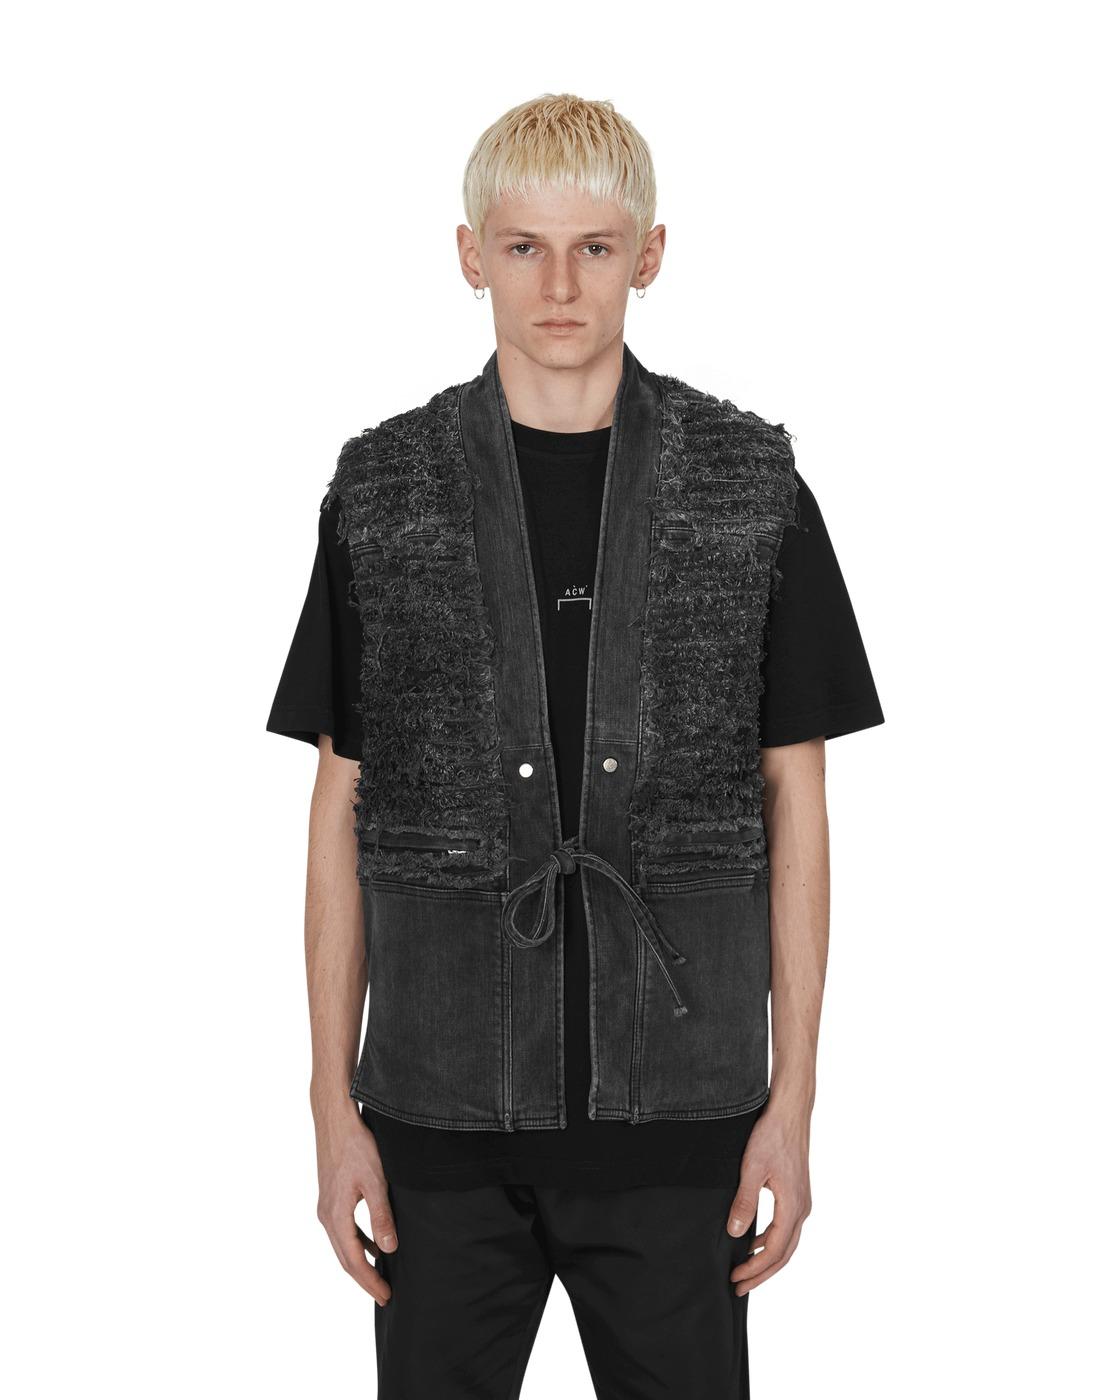 1017 Alyx 9sm Blackmeans Denim Vest Black